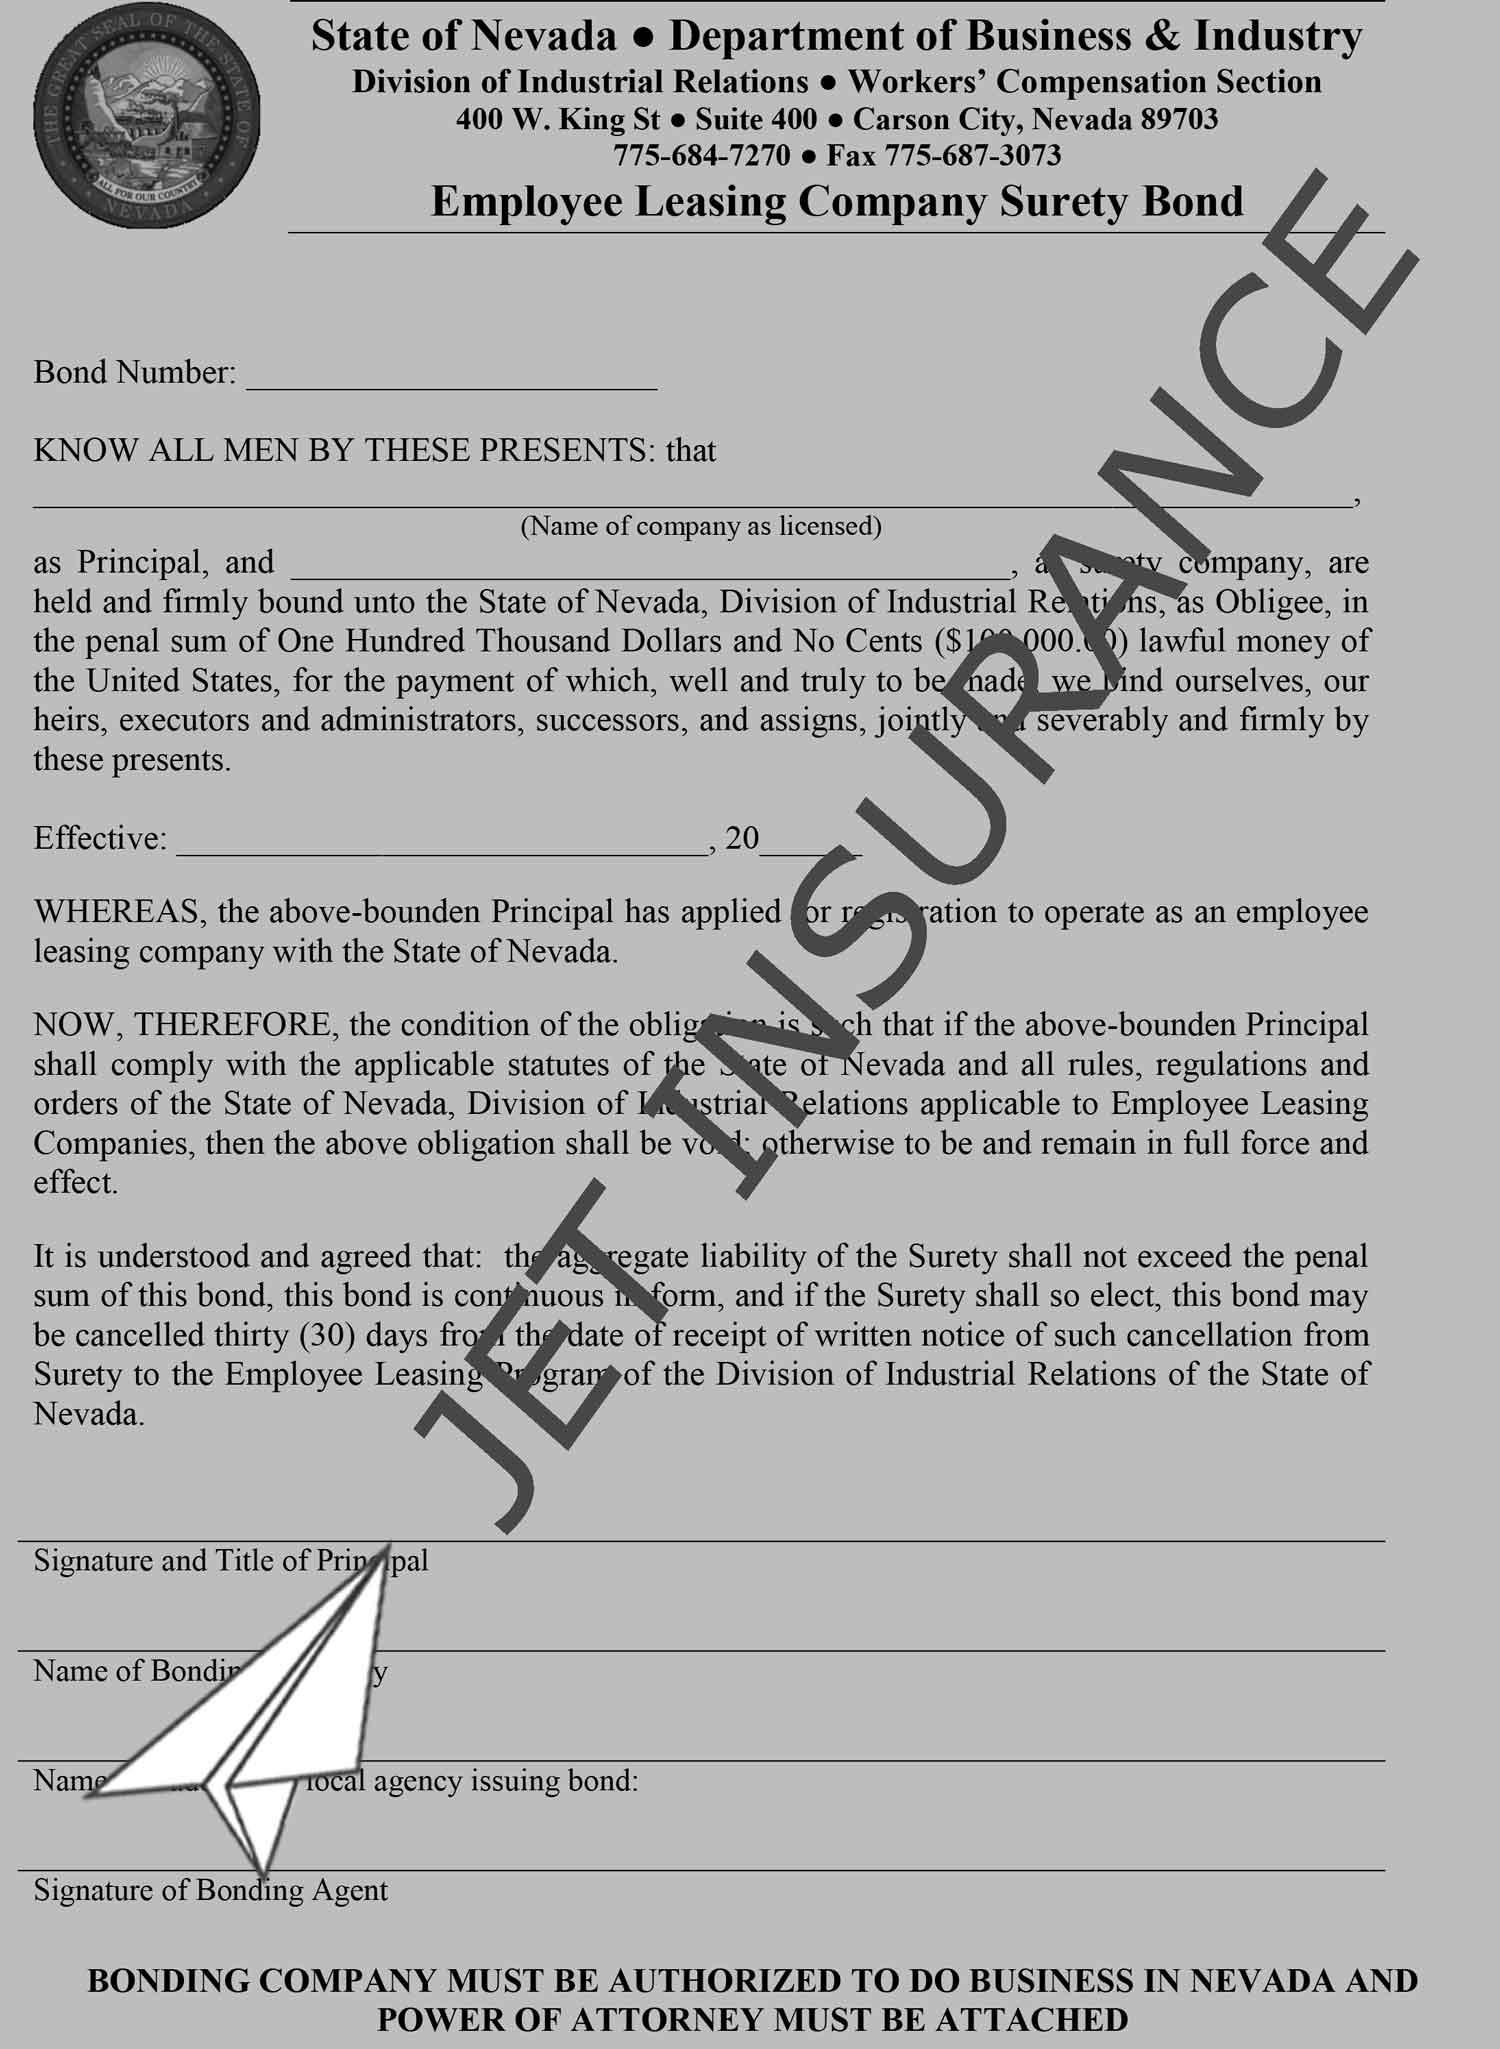 Nevada Employee Leasing Company Bond Form